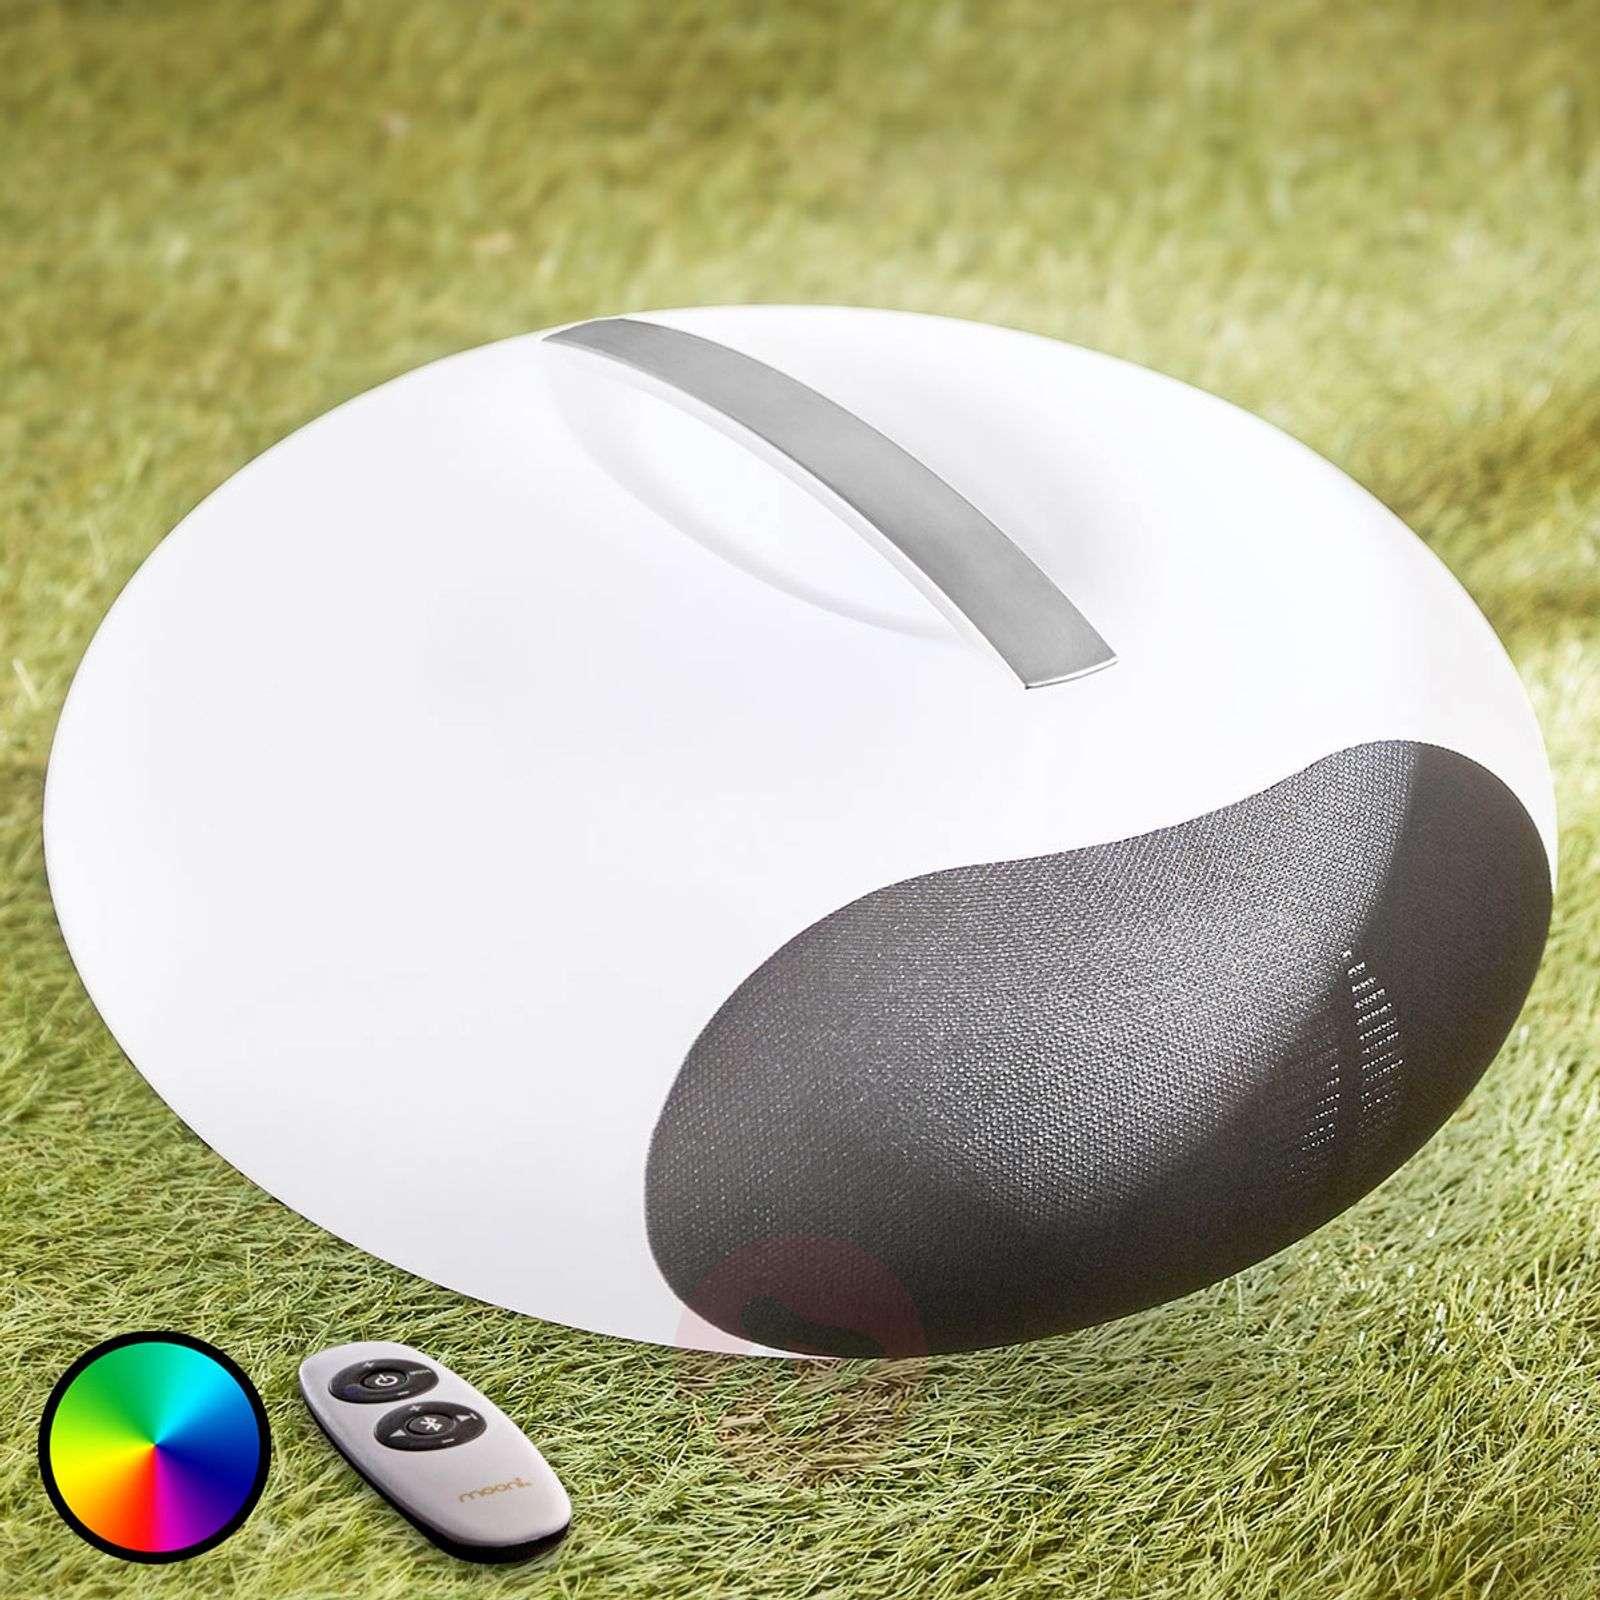 Portable speaker Jupita with RGB LEDs-6729002-01